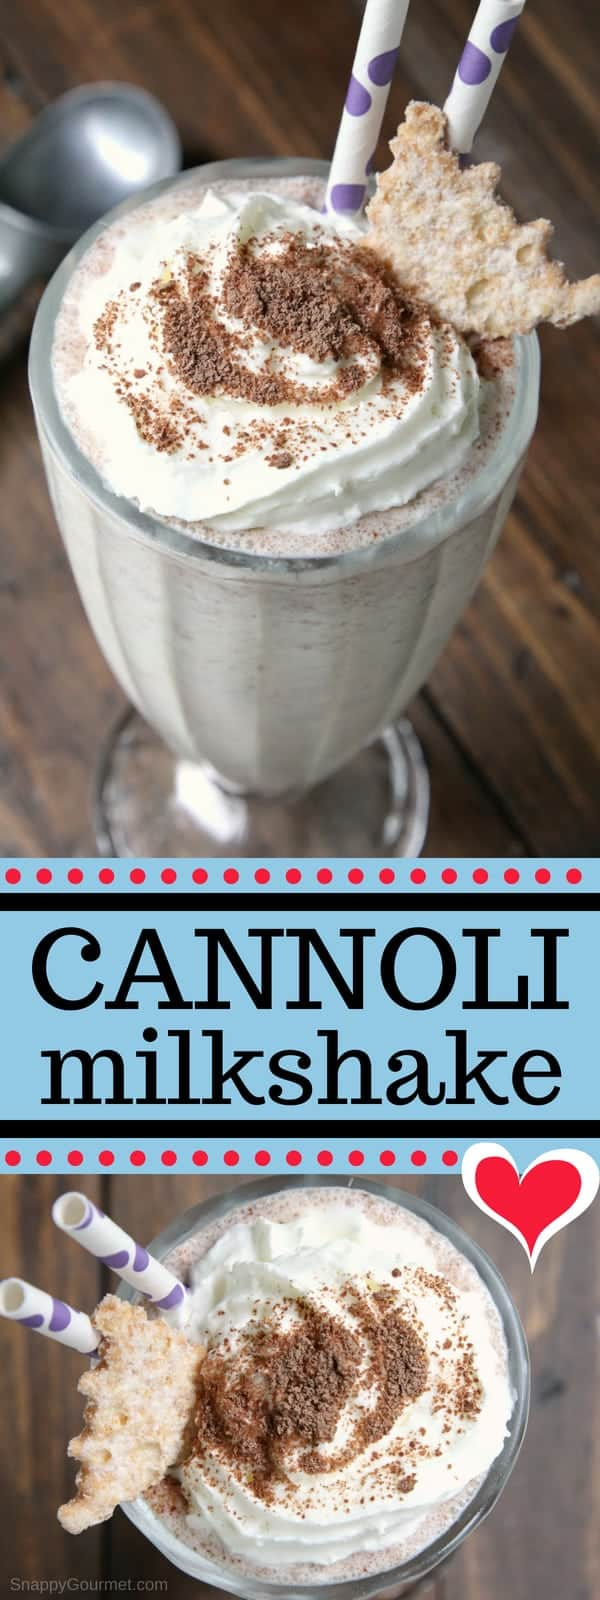 Homemade Cannoli Milkshake - fun milkshake recipe with vanilla, ricotta, orange, and chocolate! #SnappyGourmet #Milkshake #Dessert #Cannoli #Italian #Recipe #IceCream